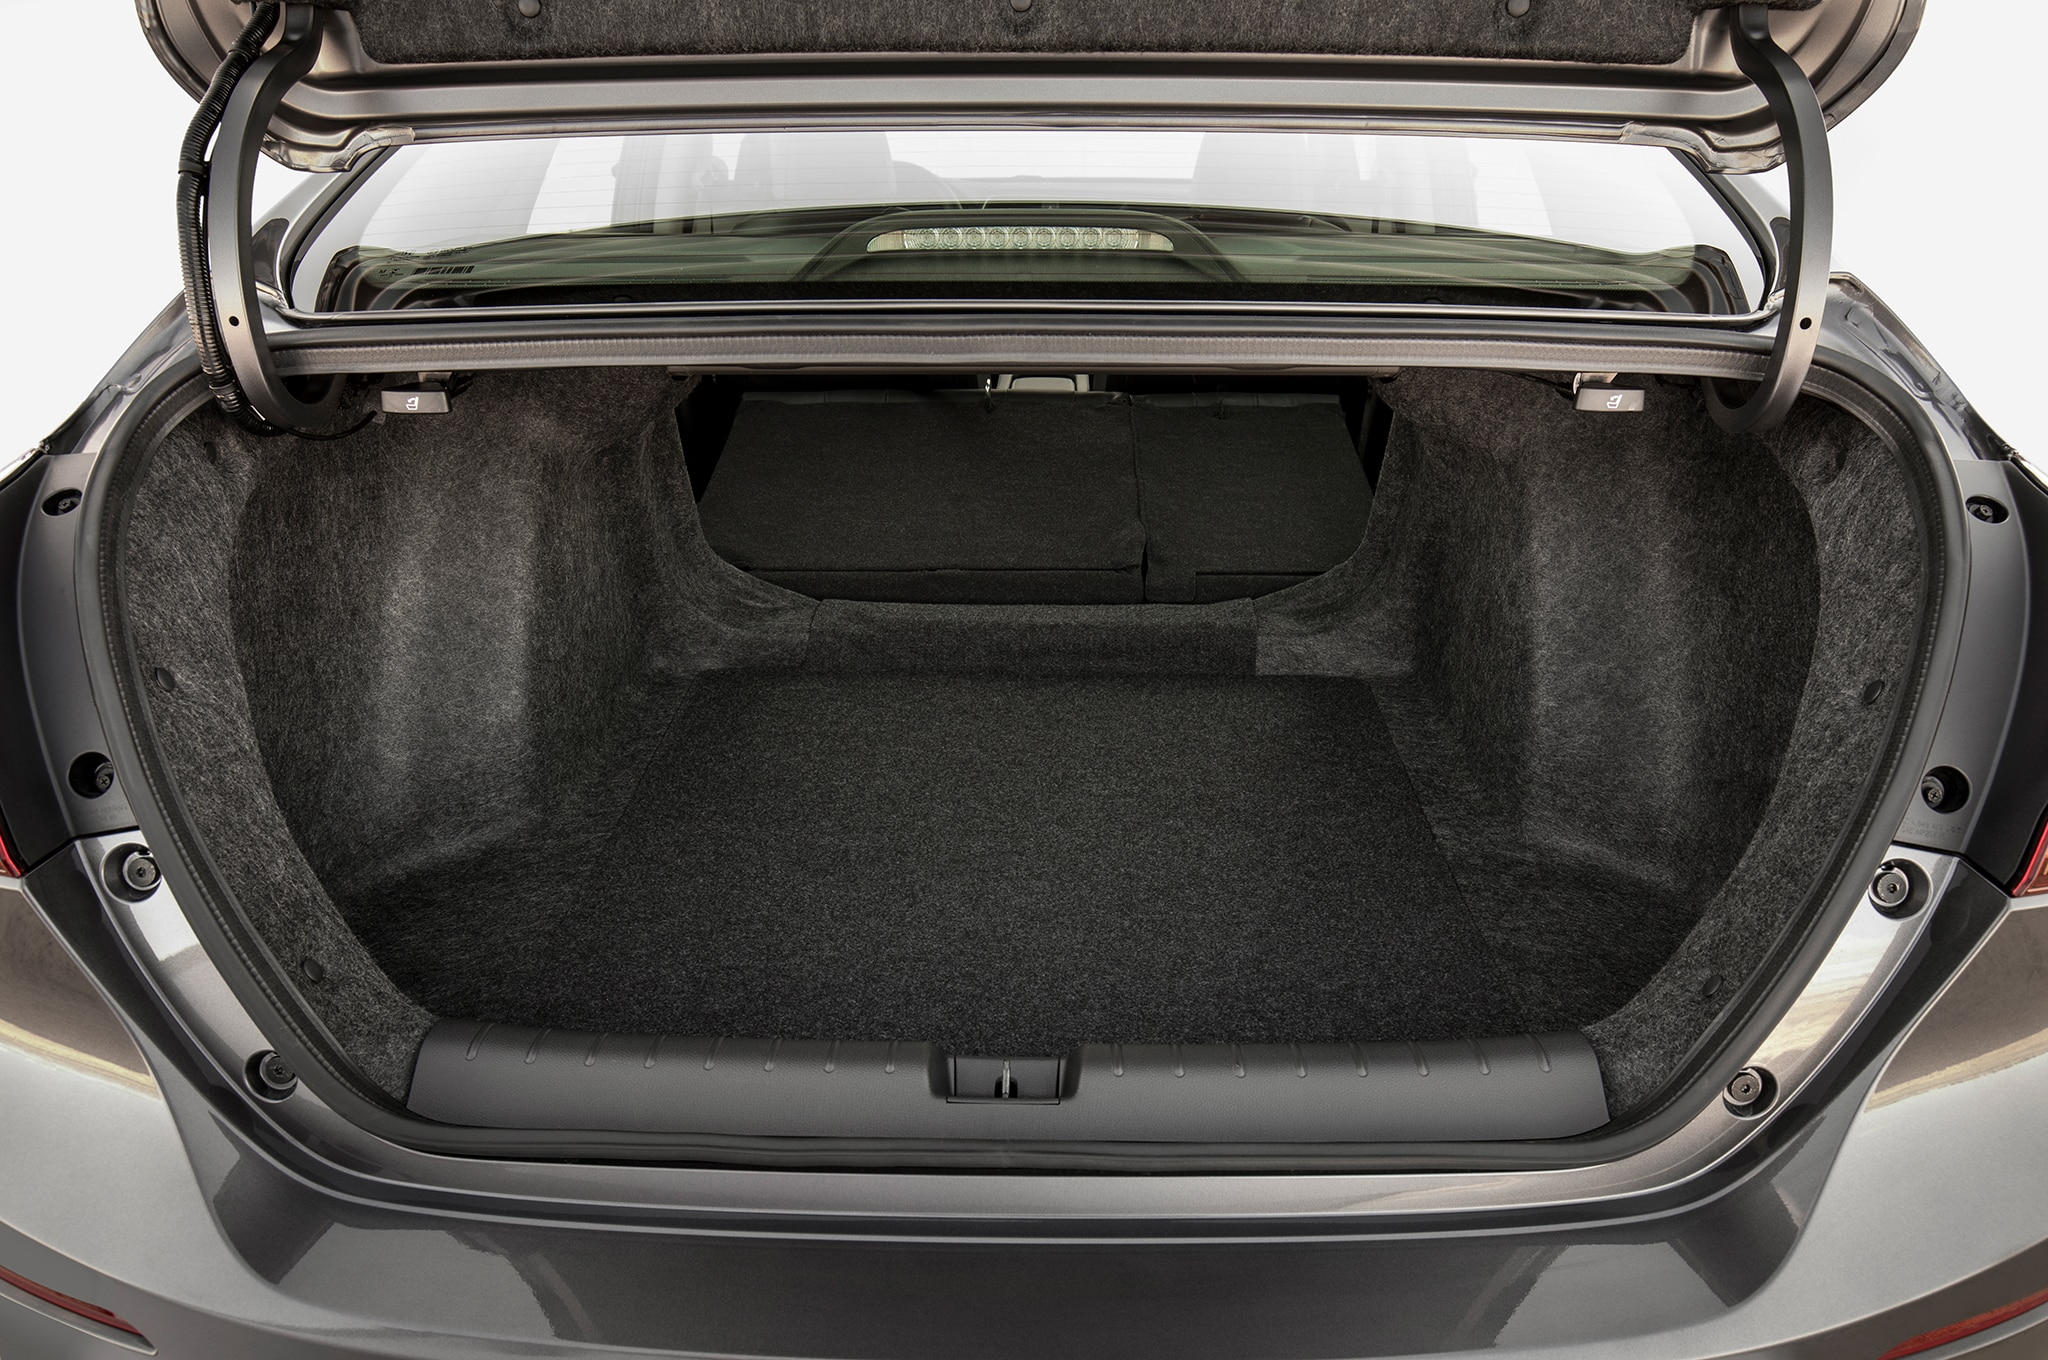 2019 Honda Insight Gets Up to 55 MPG | Automobile Magazine